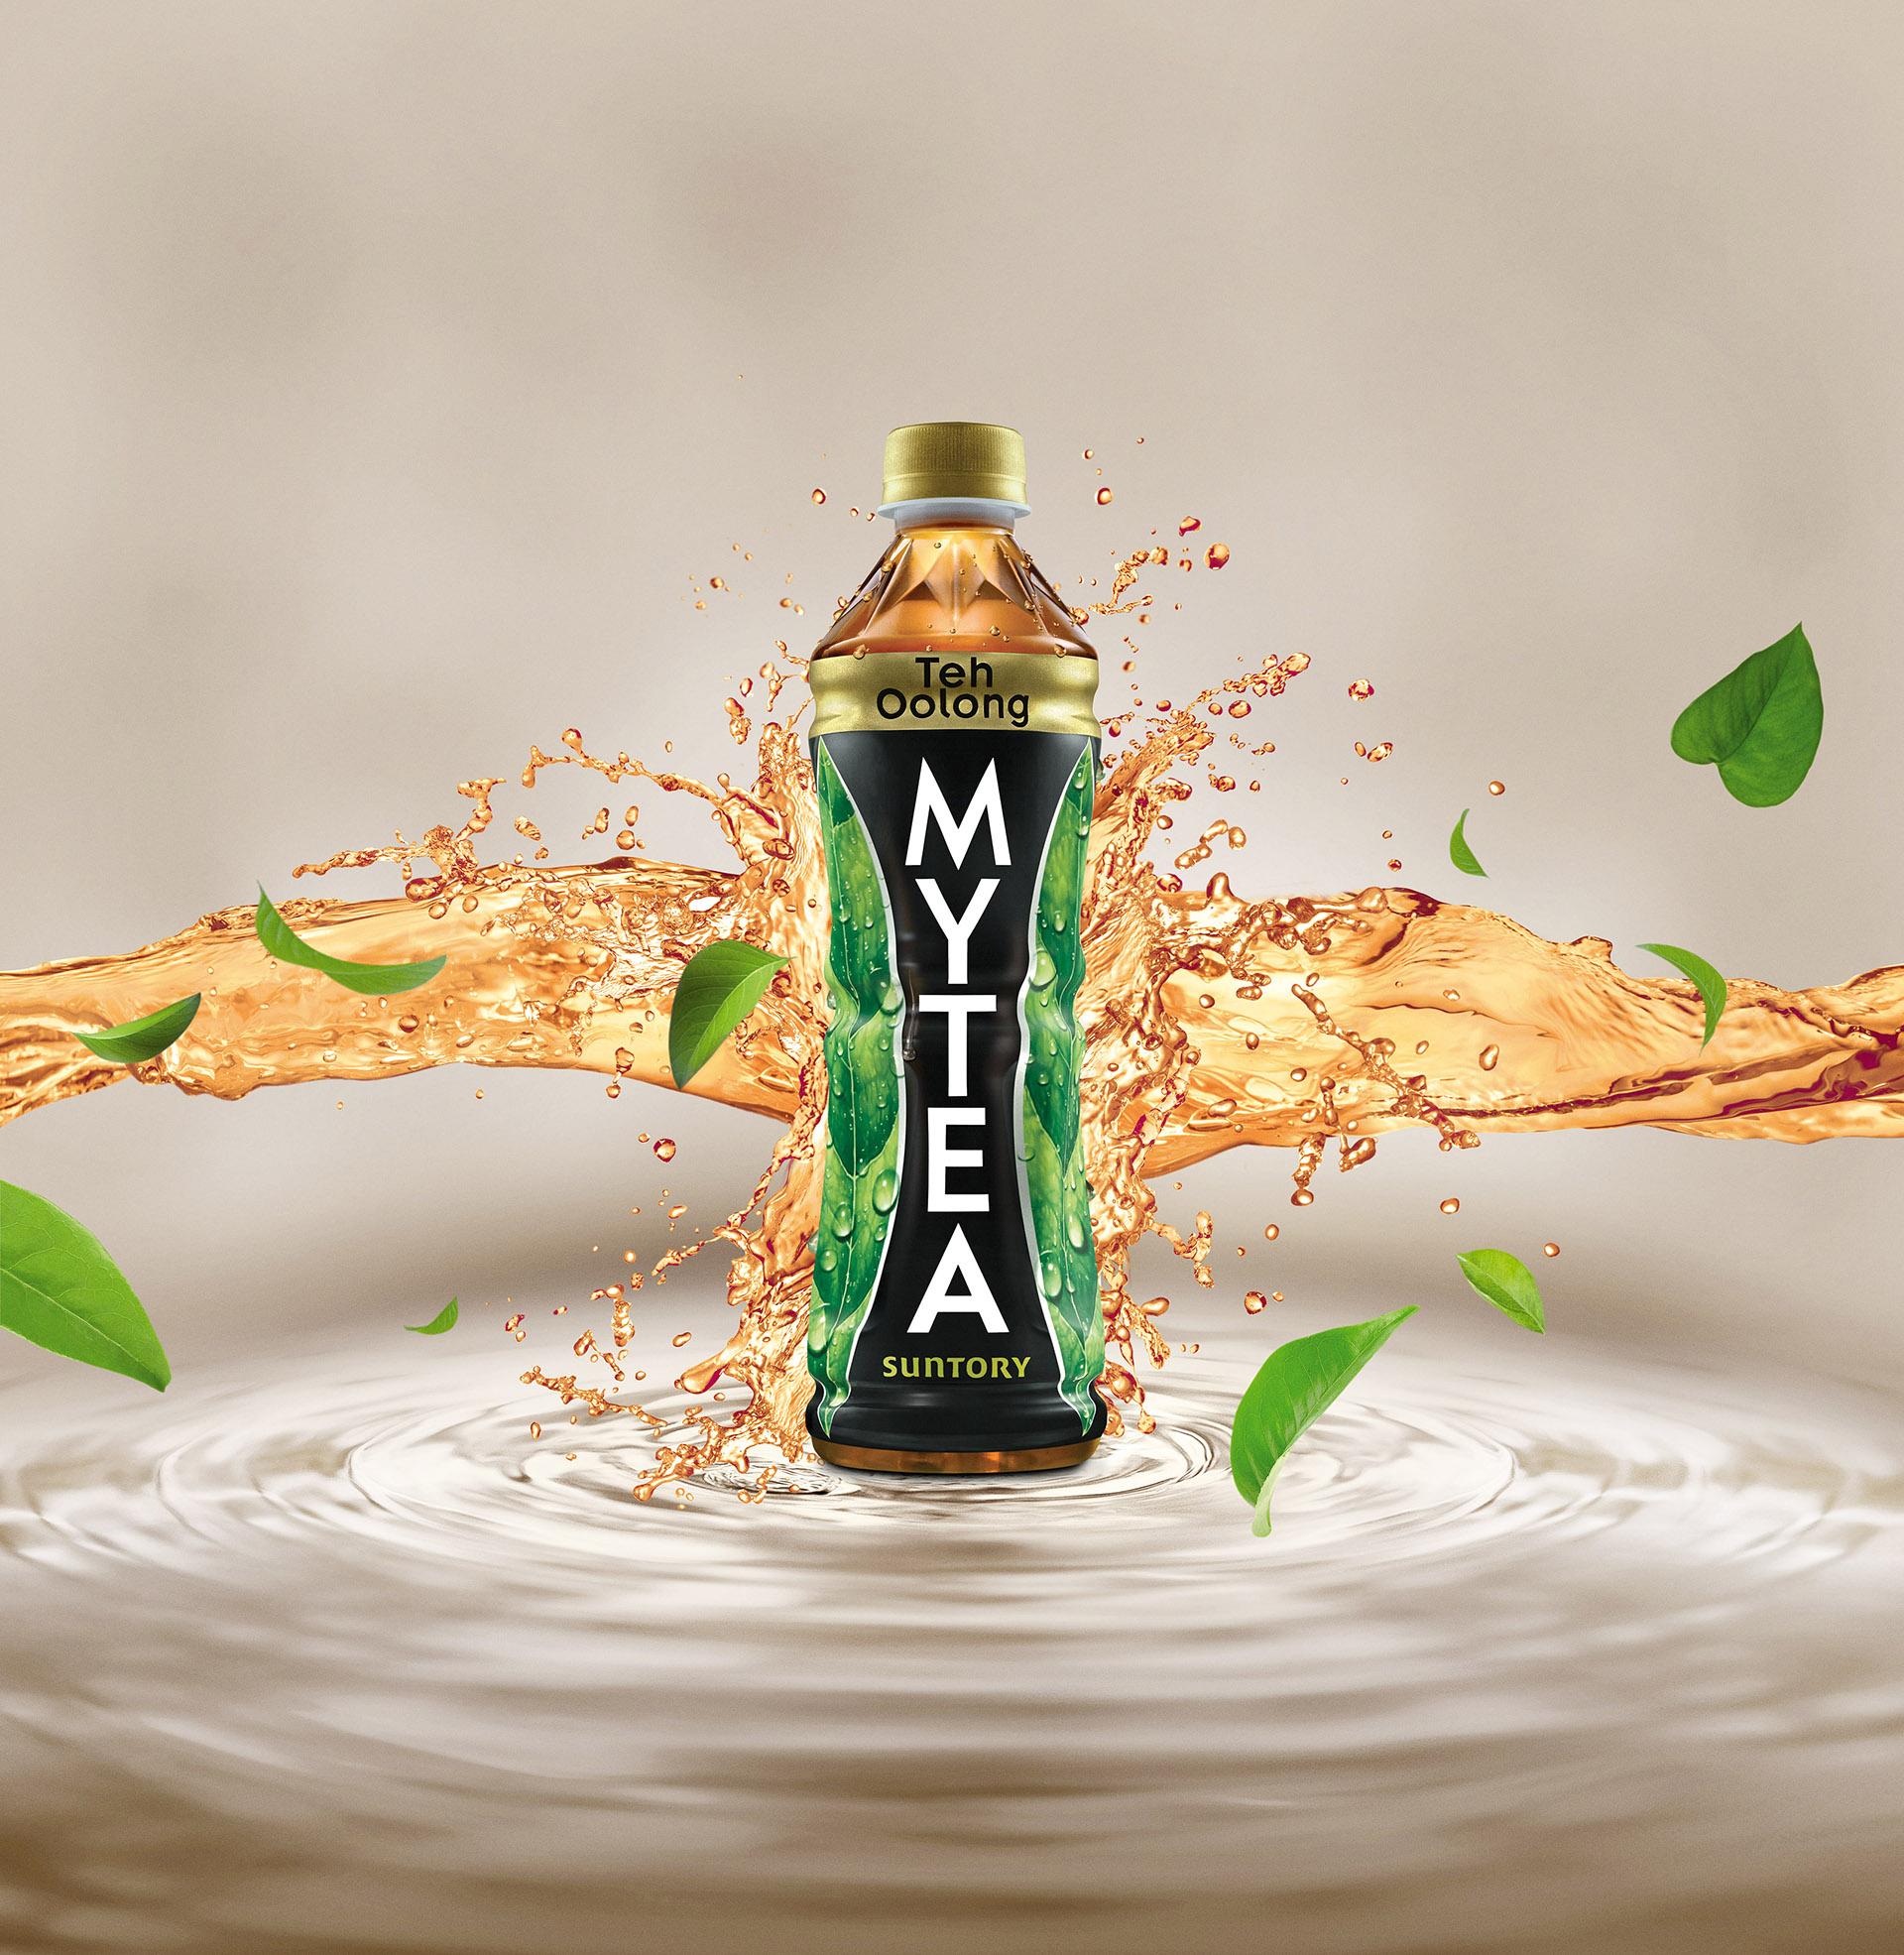 074 MyTea